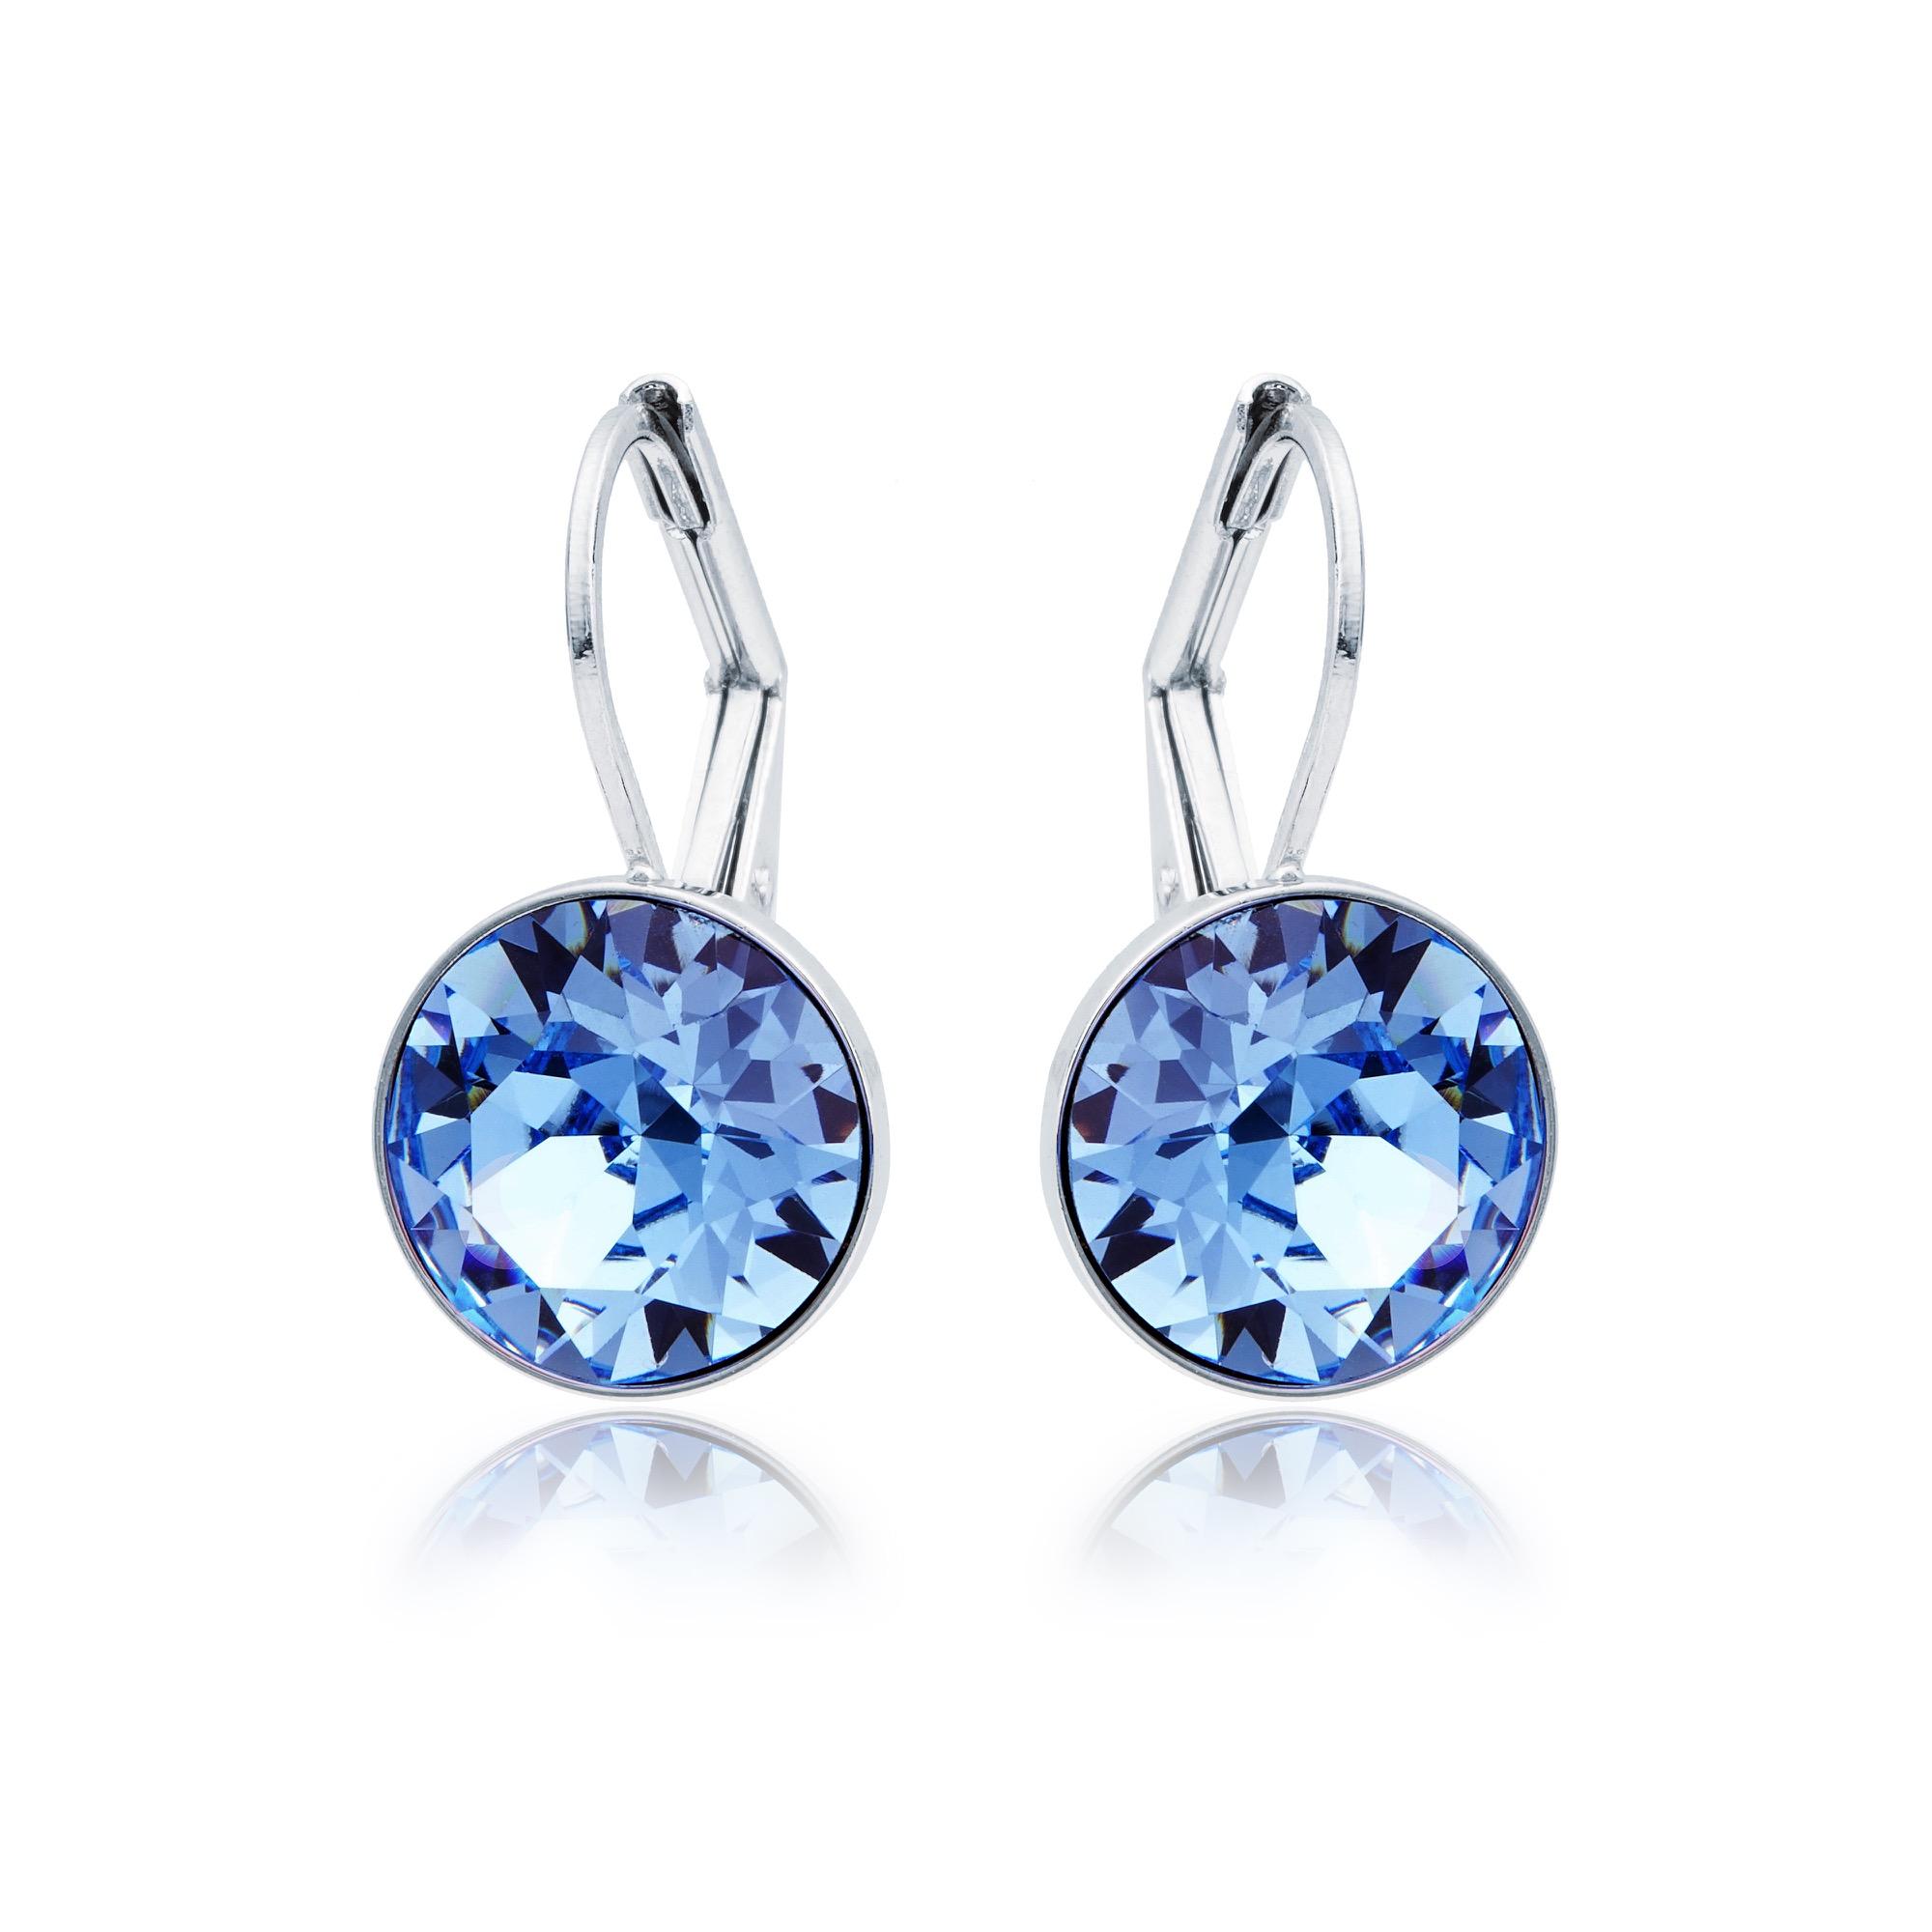 76a288182cf355 MYJS Bella Mini Earrings with Light Sapphire Blue Swarovski Crystals Rd Ptd